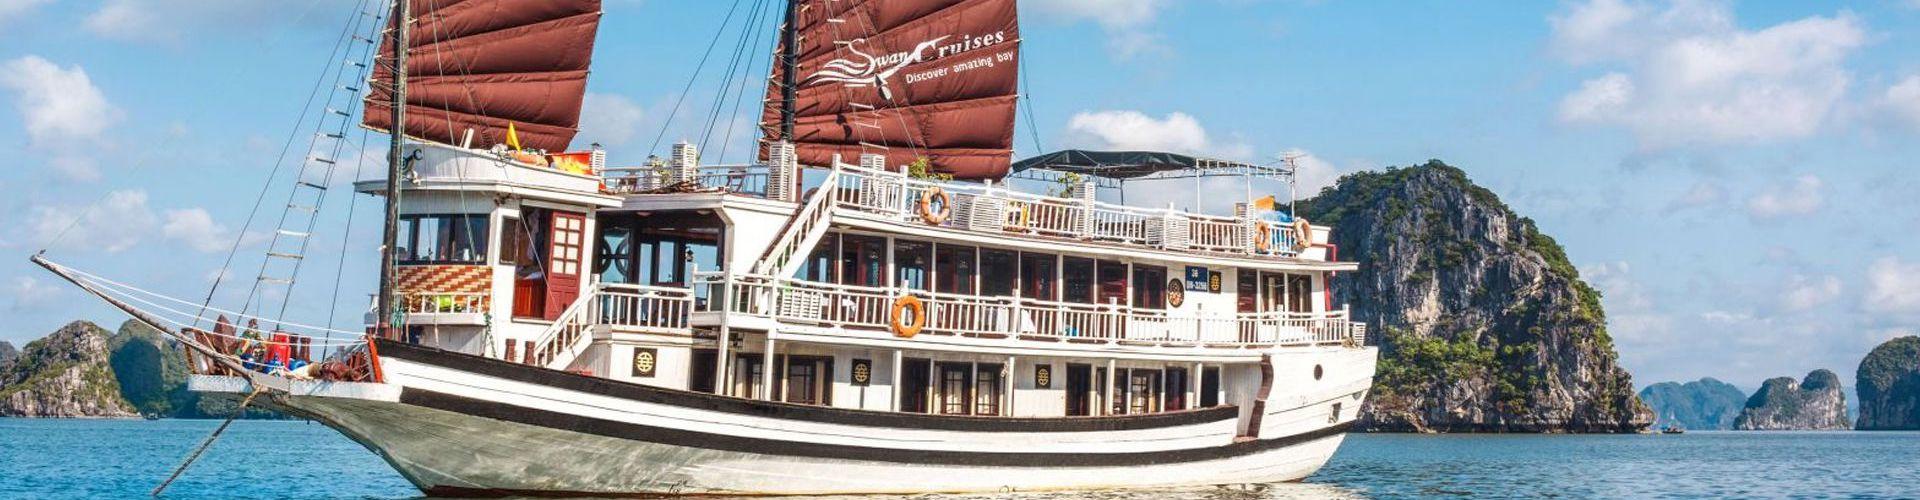 Halong Swan Cruise